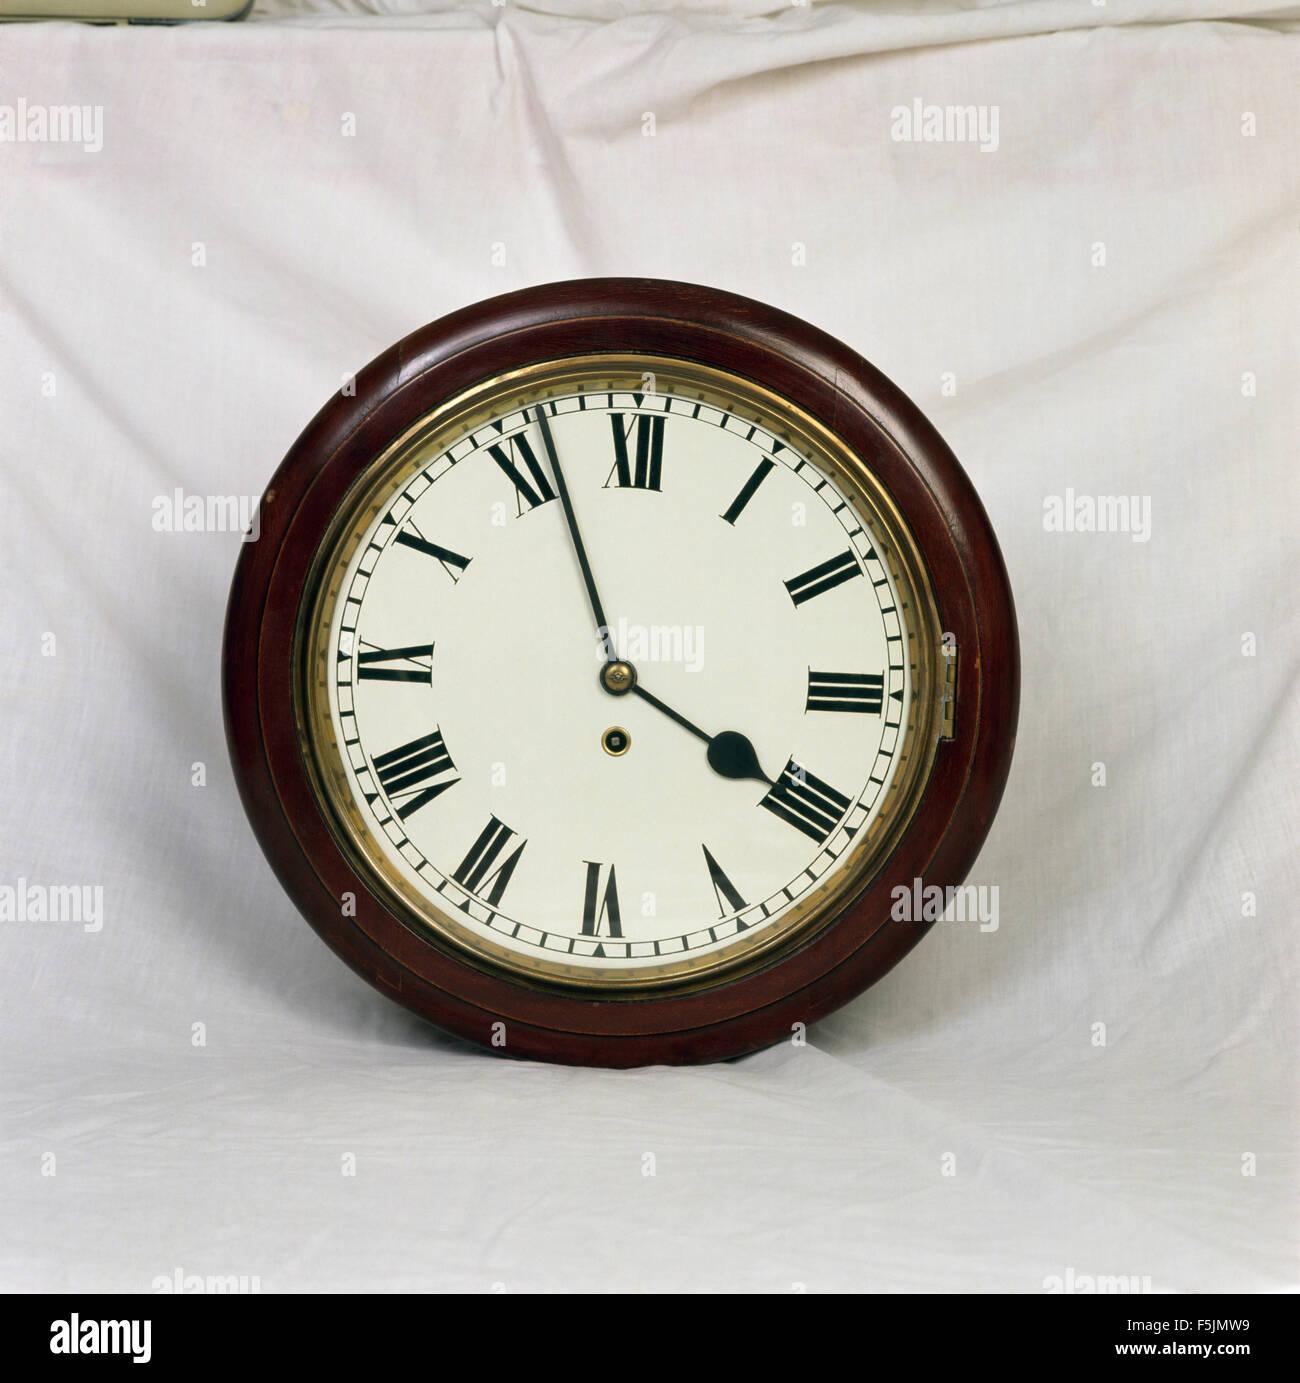 Close-up of a traditional circular wall clock - Stock Image